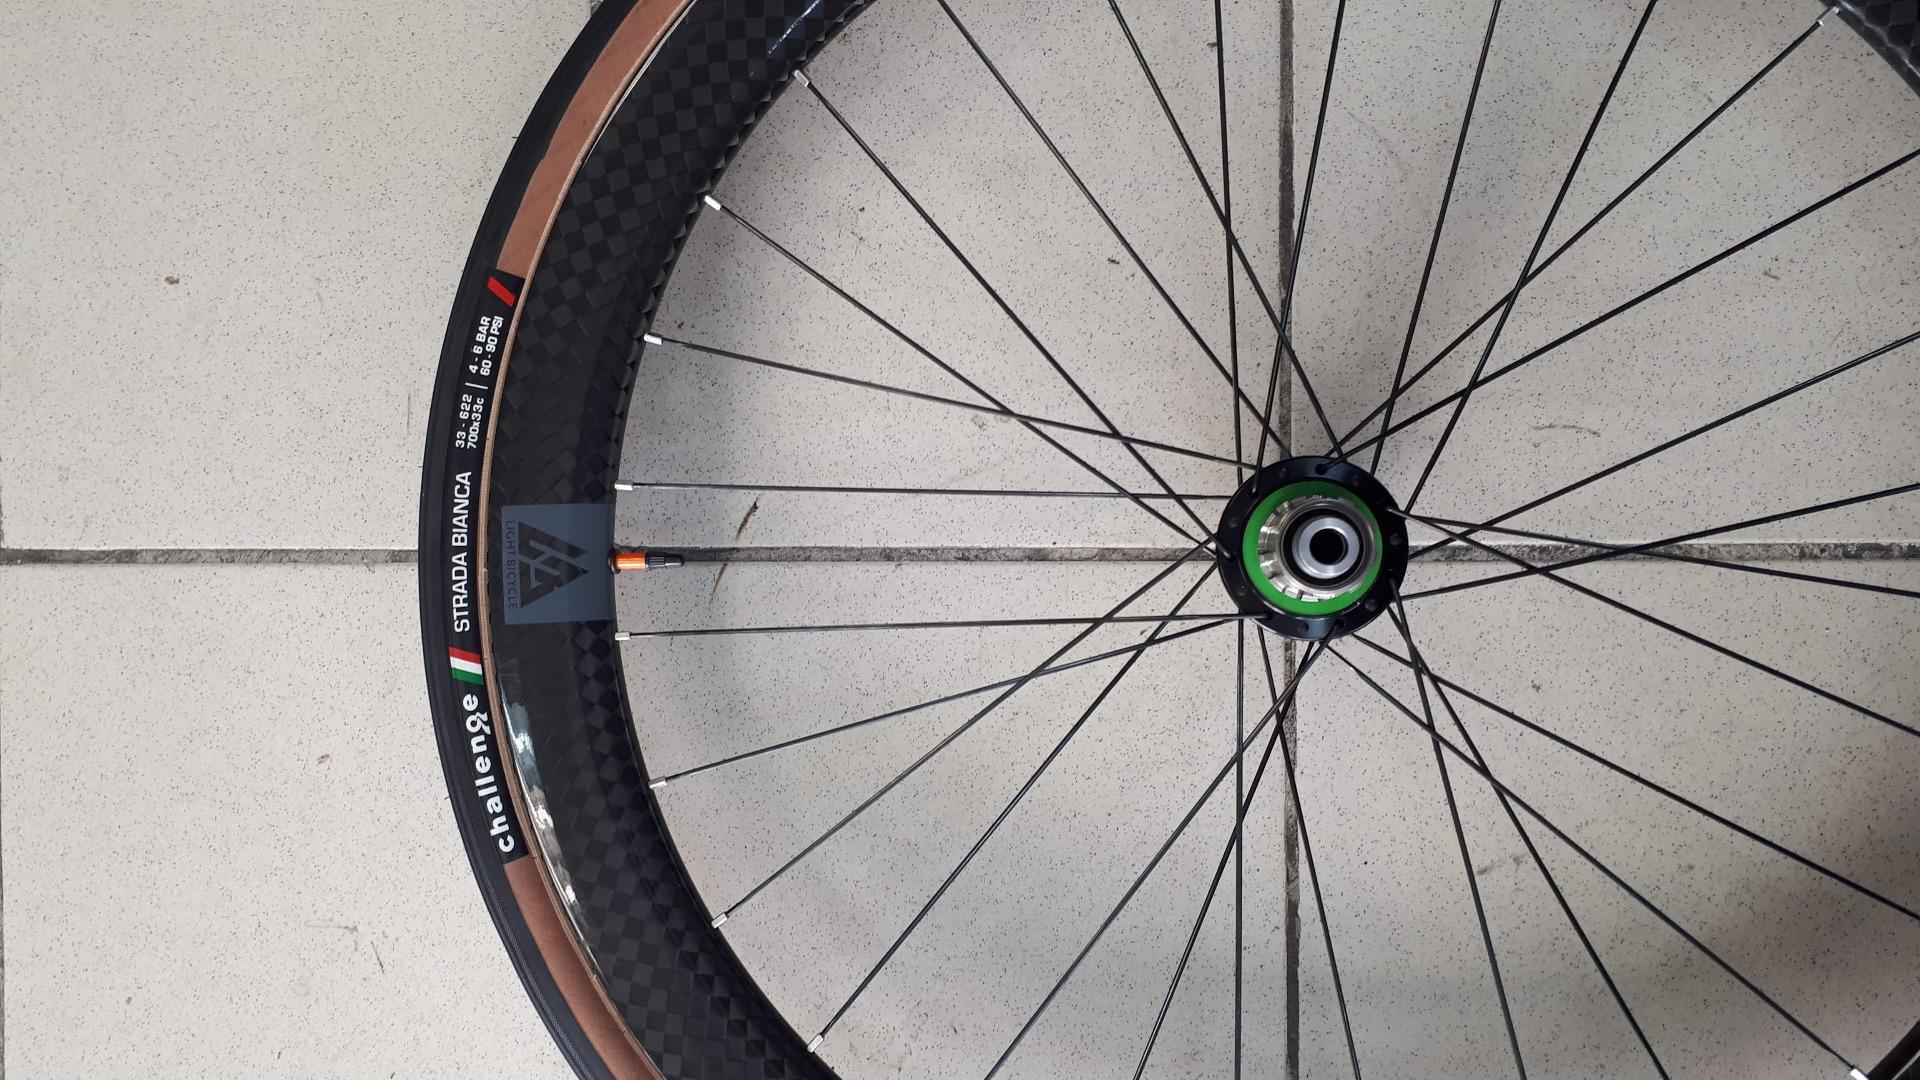 700c-ar46-46mm-road-carbon-wheel-strada-bianca-33c-tire